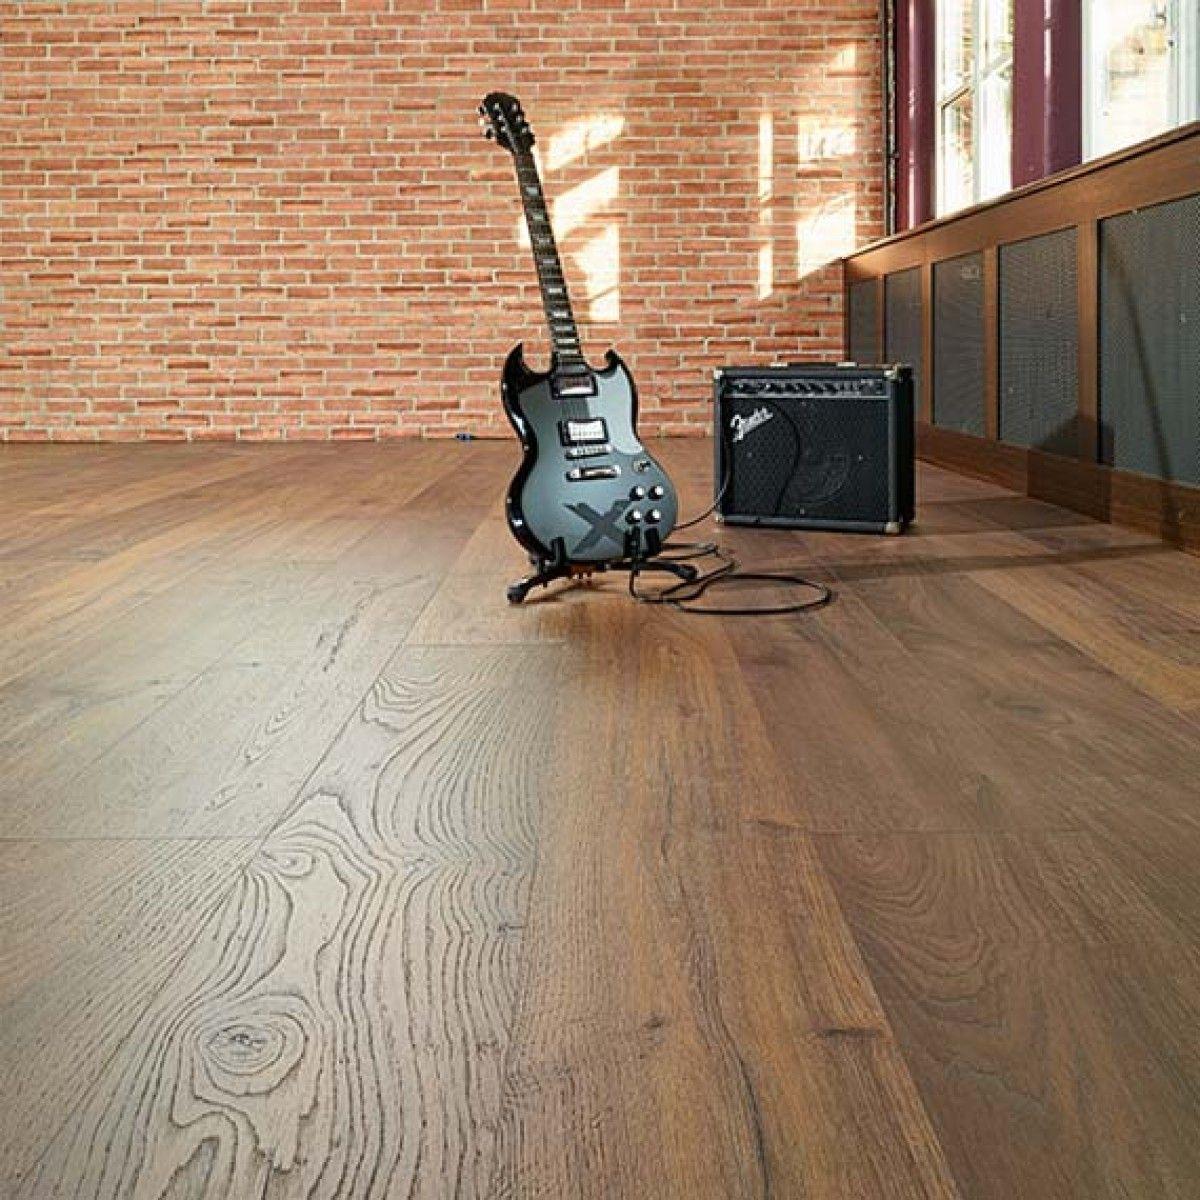 Flooring Laminate Vinyl Wood, Weight Of Laminate Flooring